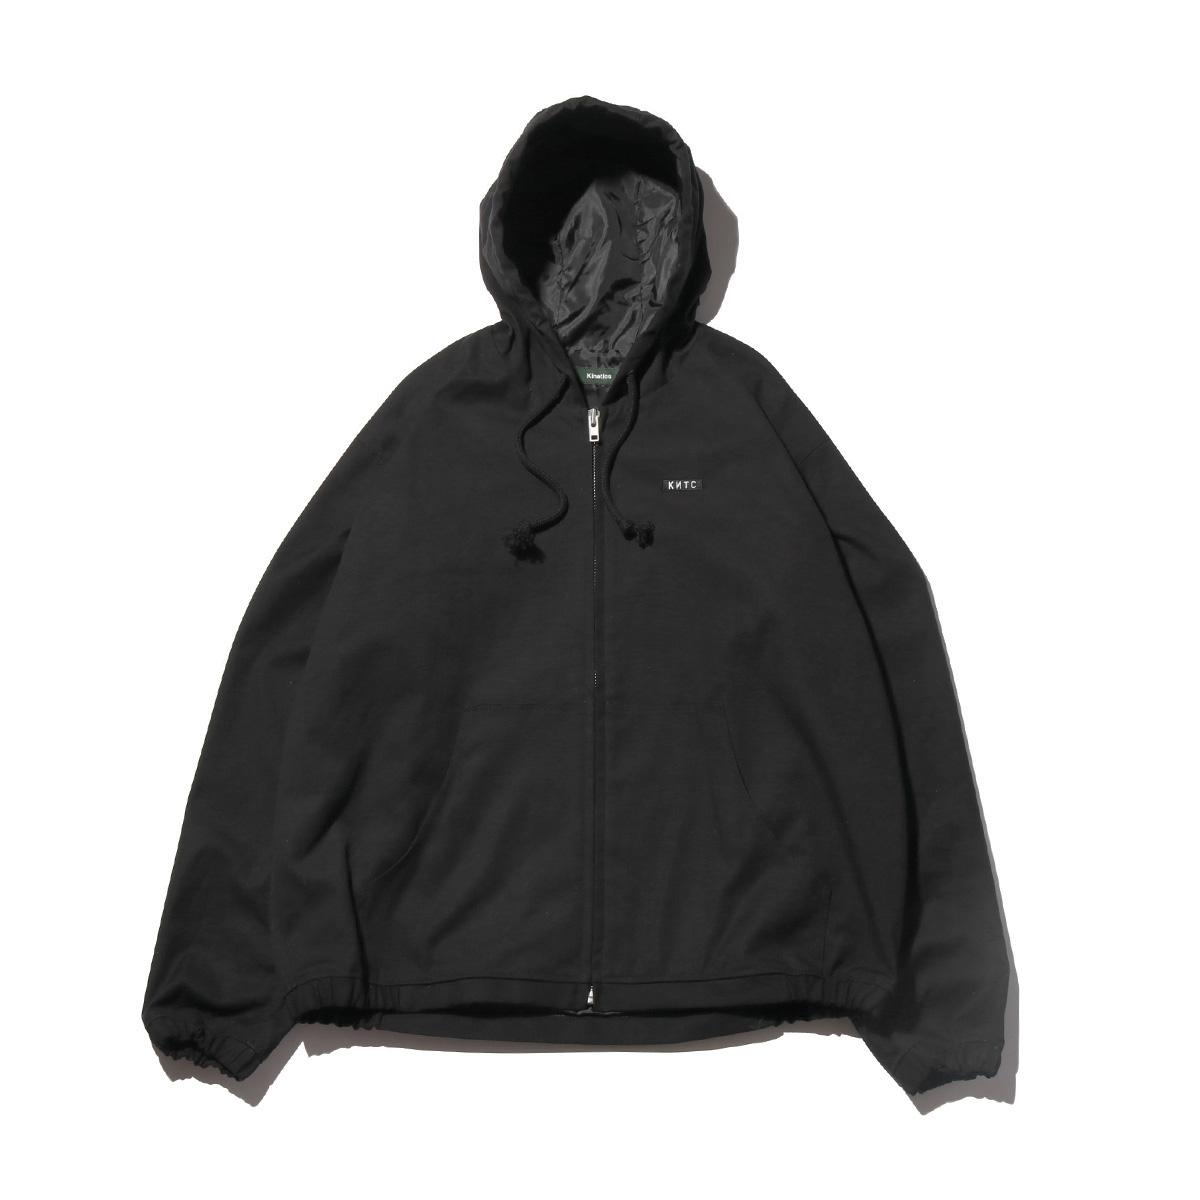 Kinetics Hooded Canvas Jacket(BLACK)(キネティクス フーデッド キャンバス ジャケット)【メンズ】【ジャケット】【19SS-I】